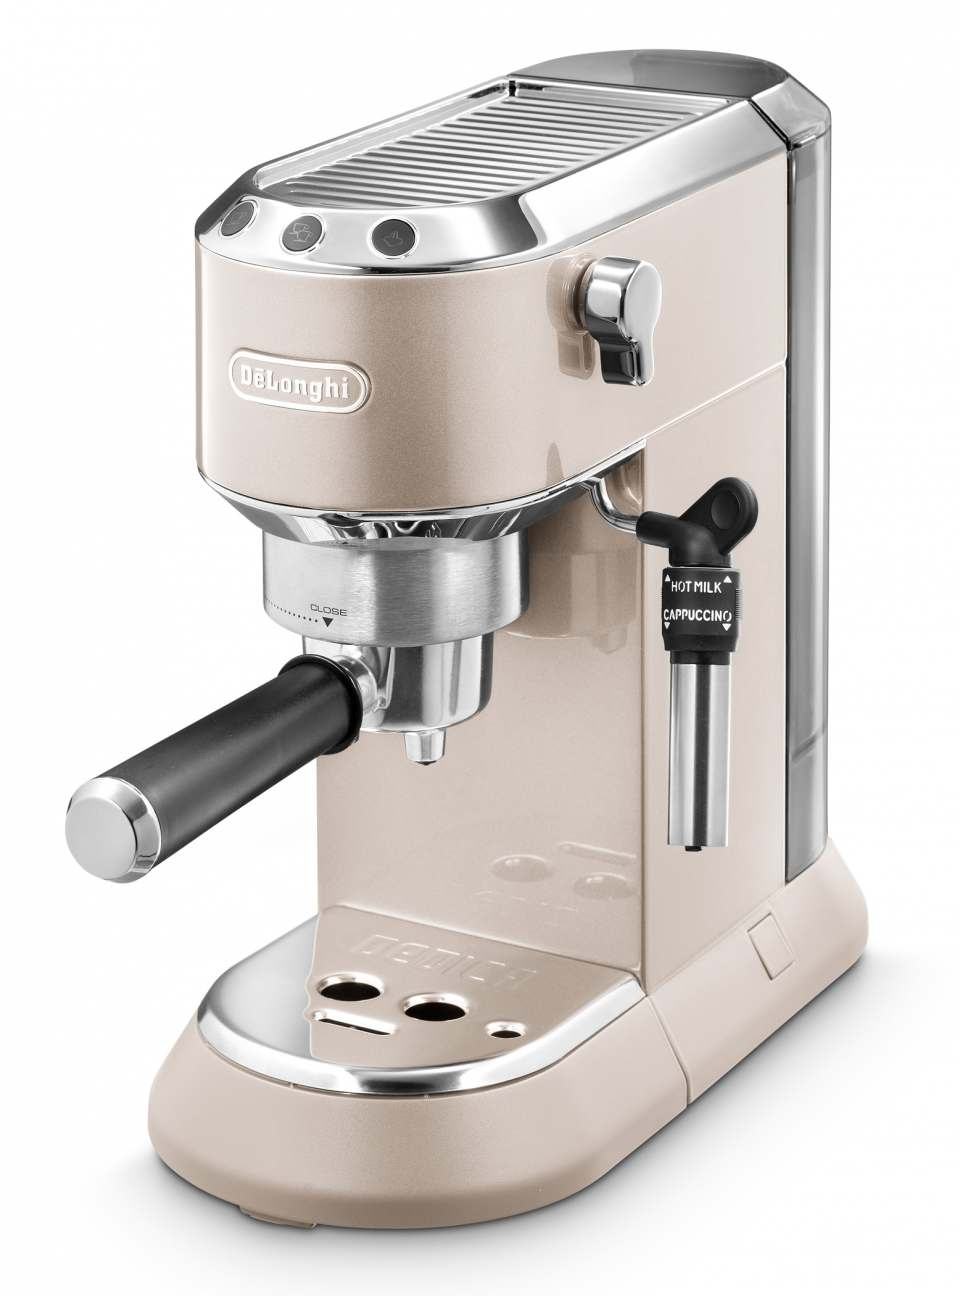 De'Longhi Espressomaschine Dedica Barista Bundle in 15 cm Breite.